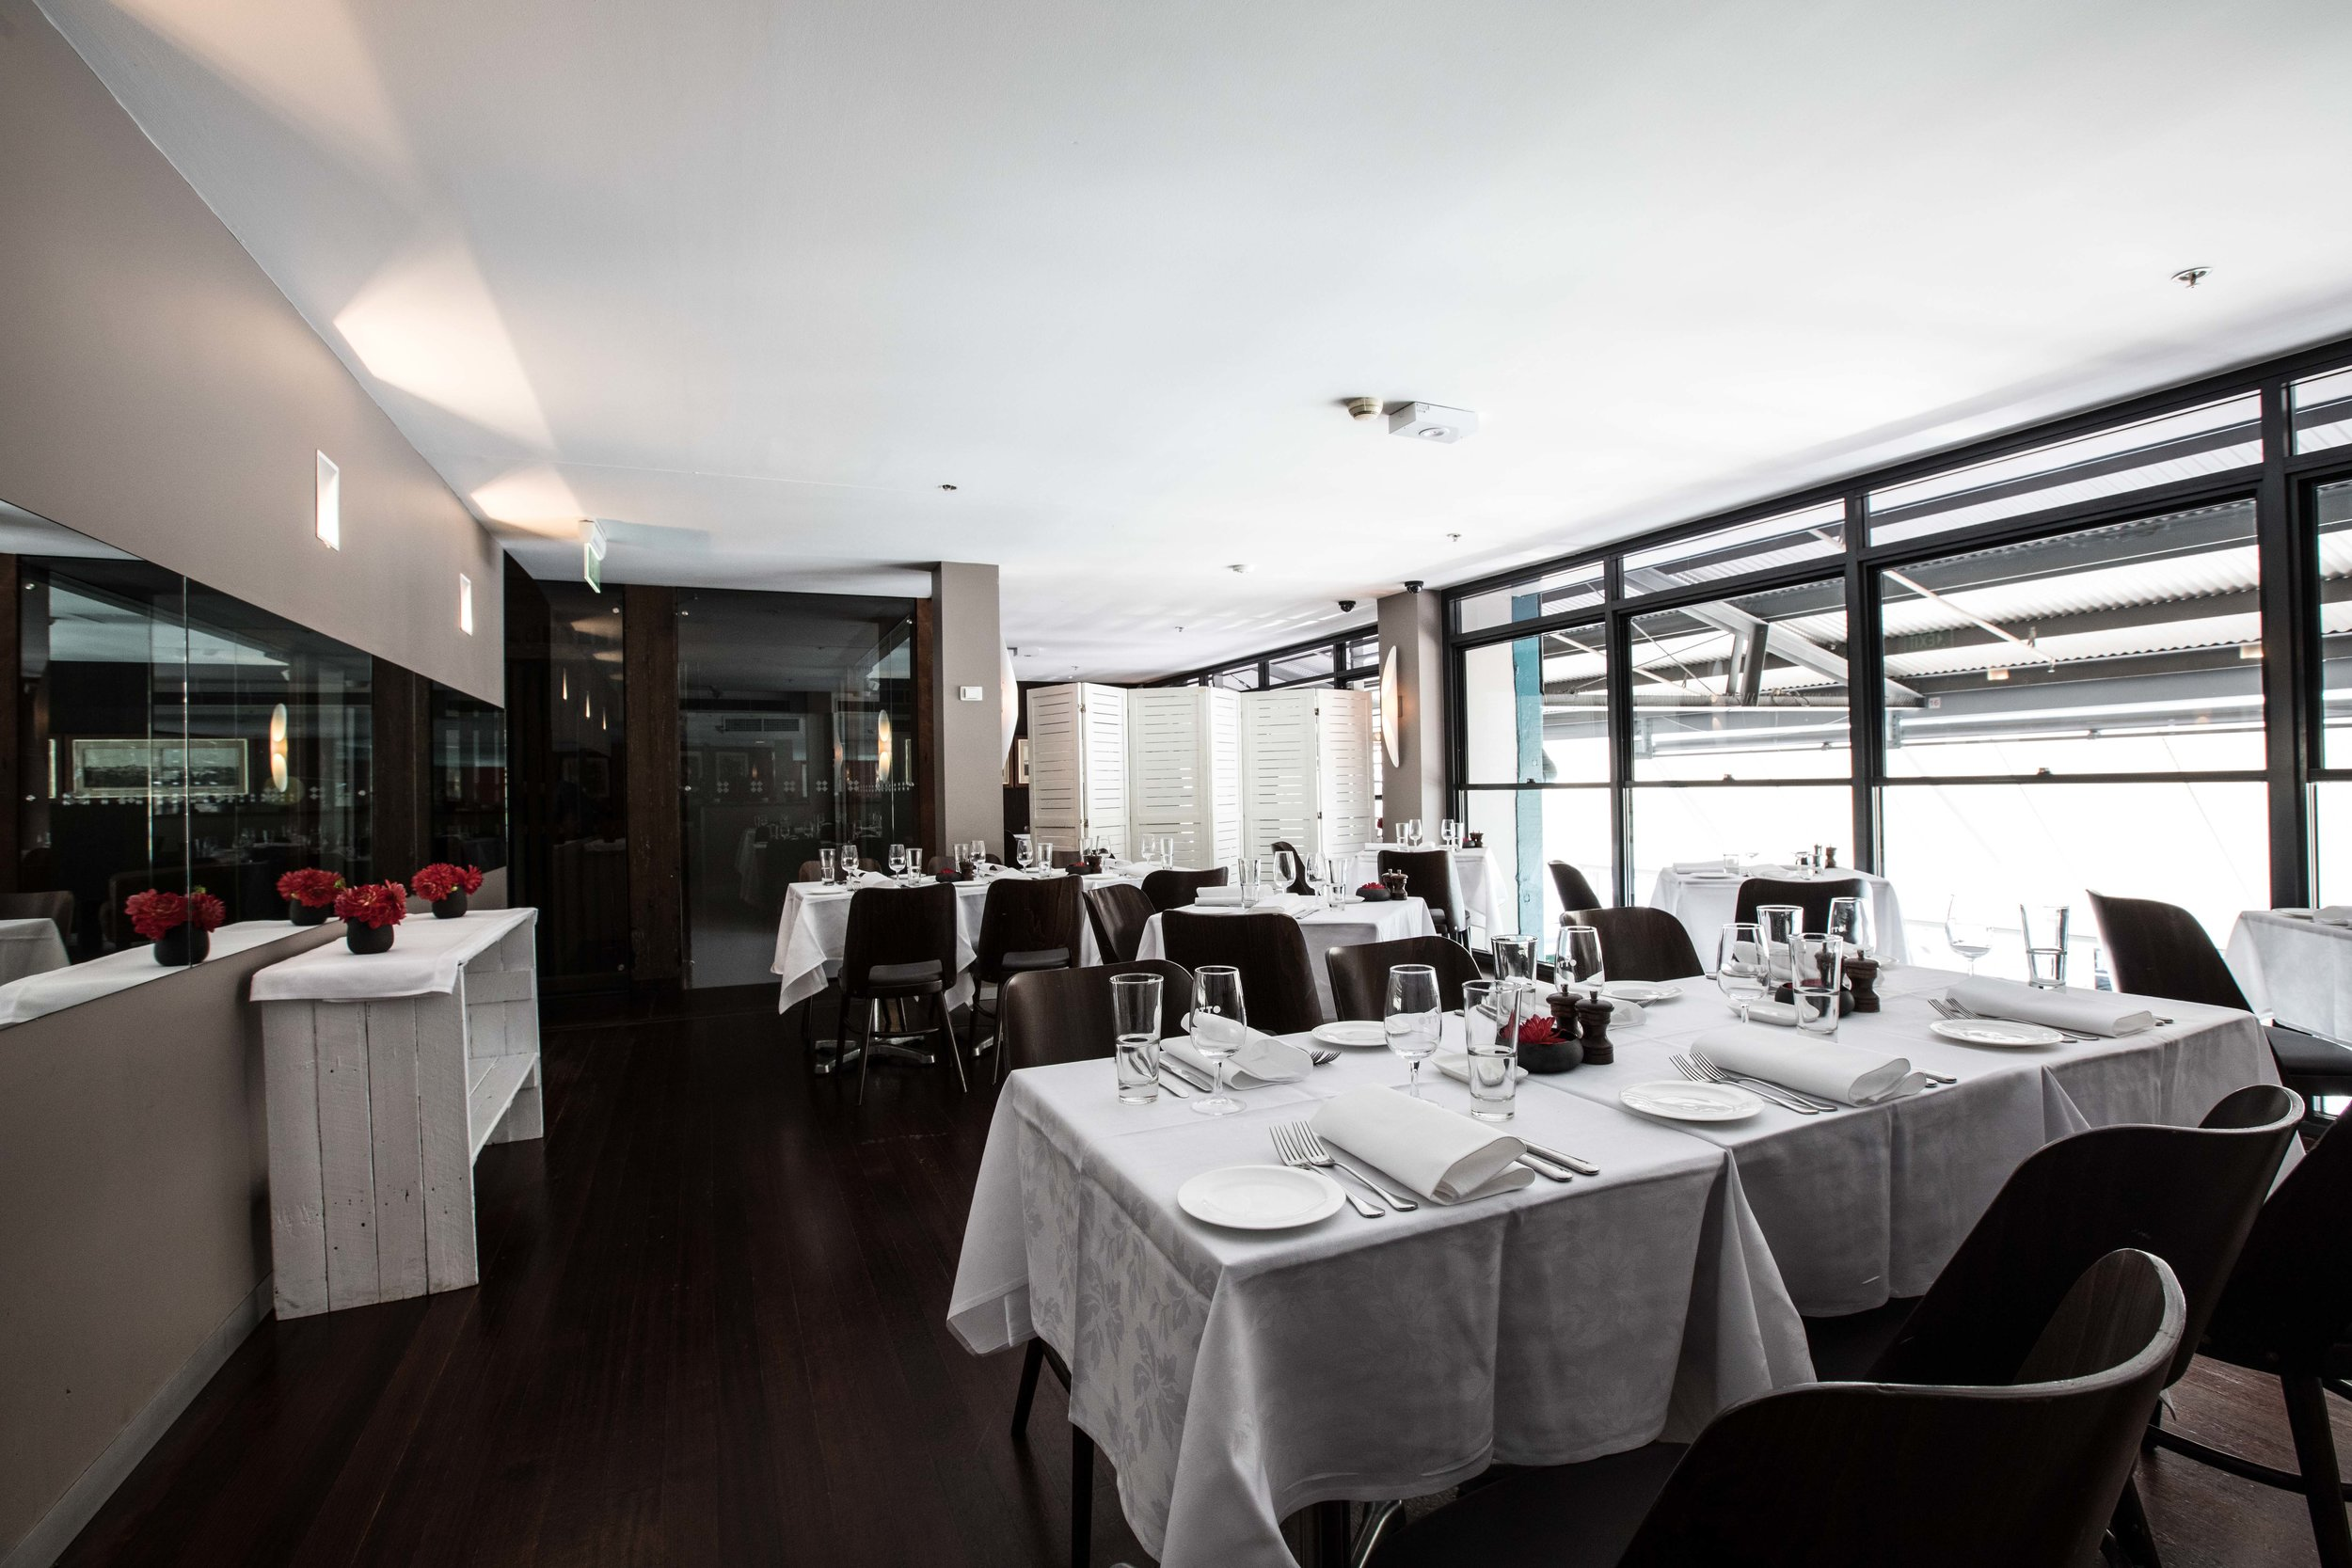 lavazza-massimo-bottura-worlds-50-best-restaurants-awards-2017-otto-private-dining-interior.jpg